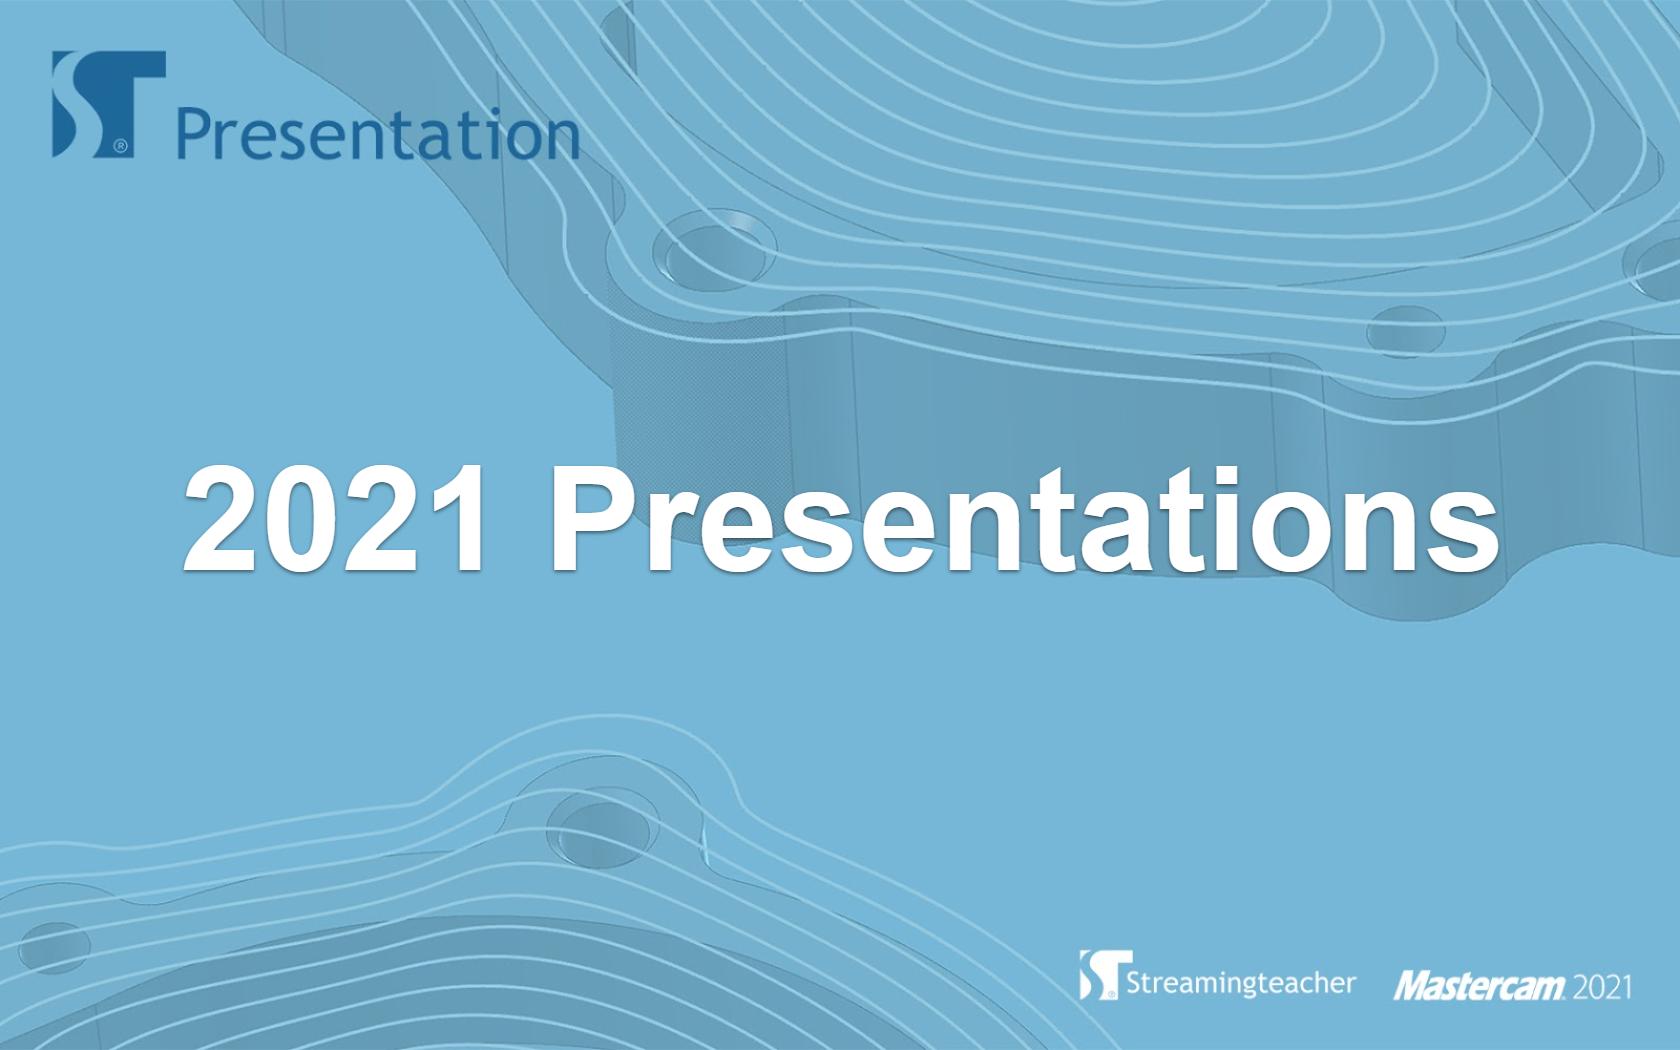 2021 Presentations